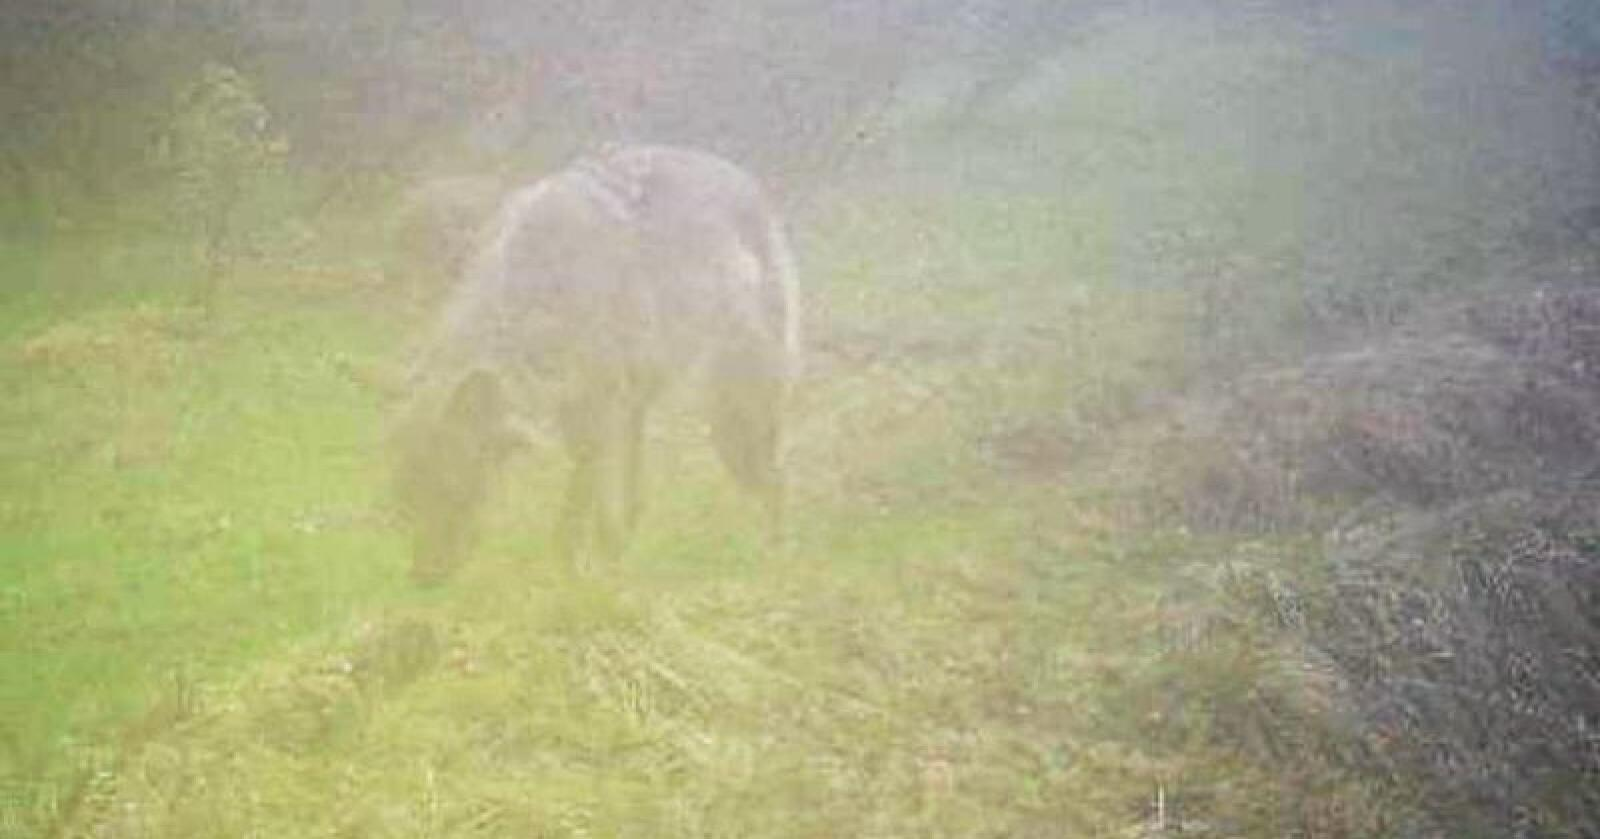 Denne ulven ble fotografert med viltkamera i Gammeldalen i Tynset i Hedmark ved fem-tiden torsdag morgen. Foto: Skadefellingslagene i Nord-Østerdalen